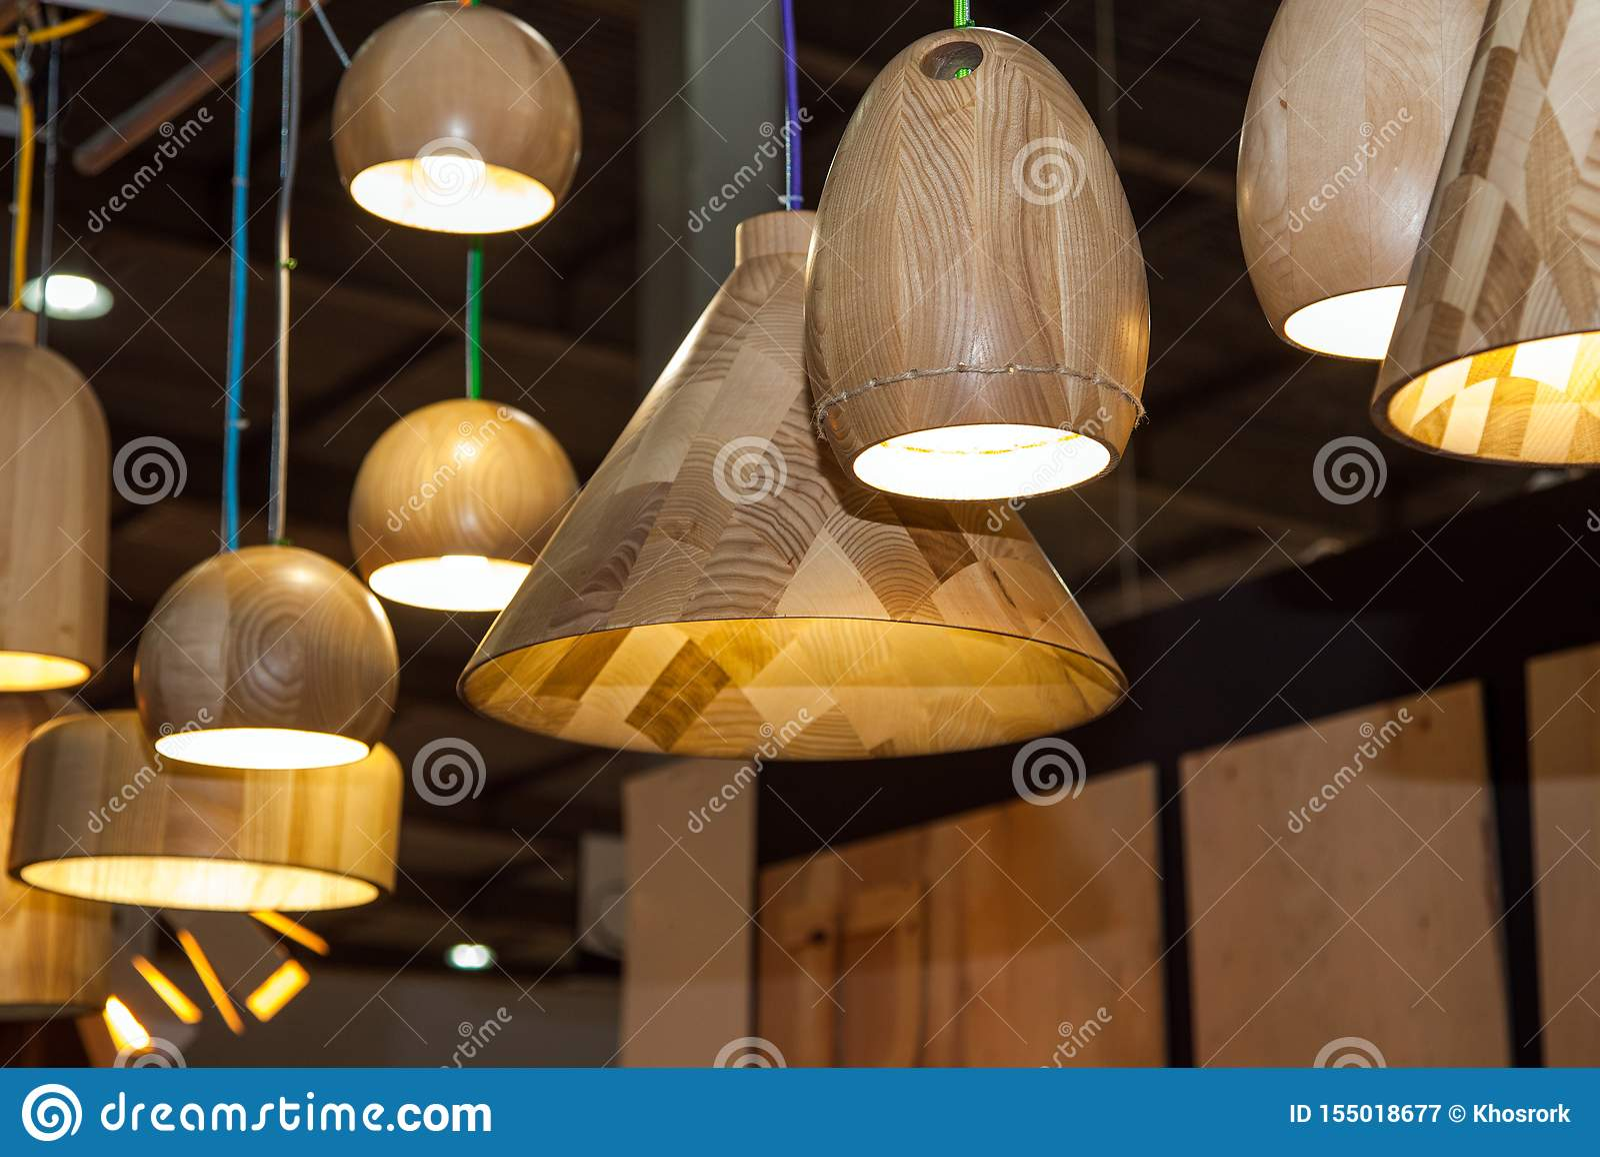 Set Of Wooden Modern Ceiling Light Fixtures Stock Image Image Of Illumination Bright 155018677